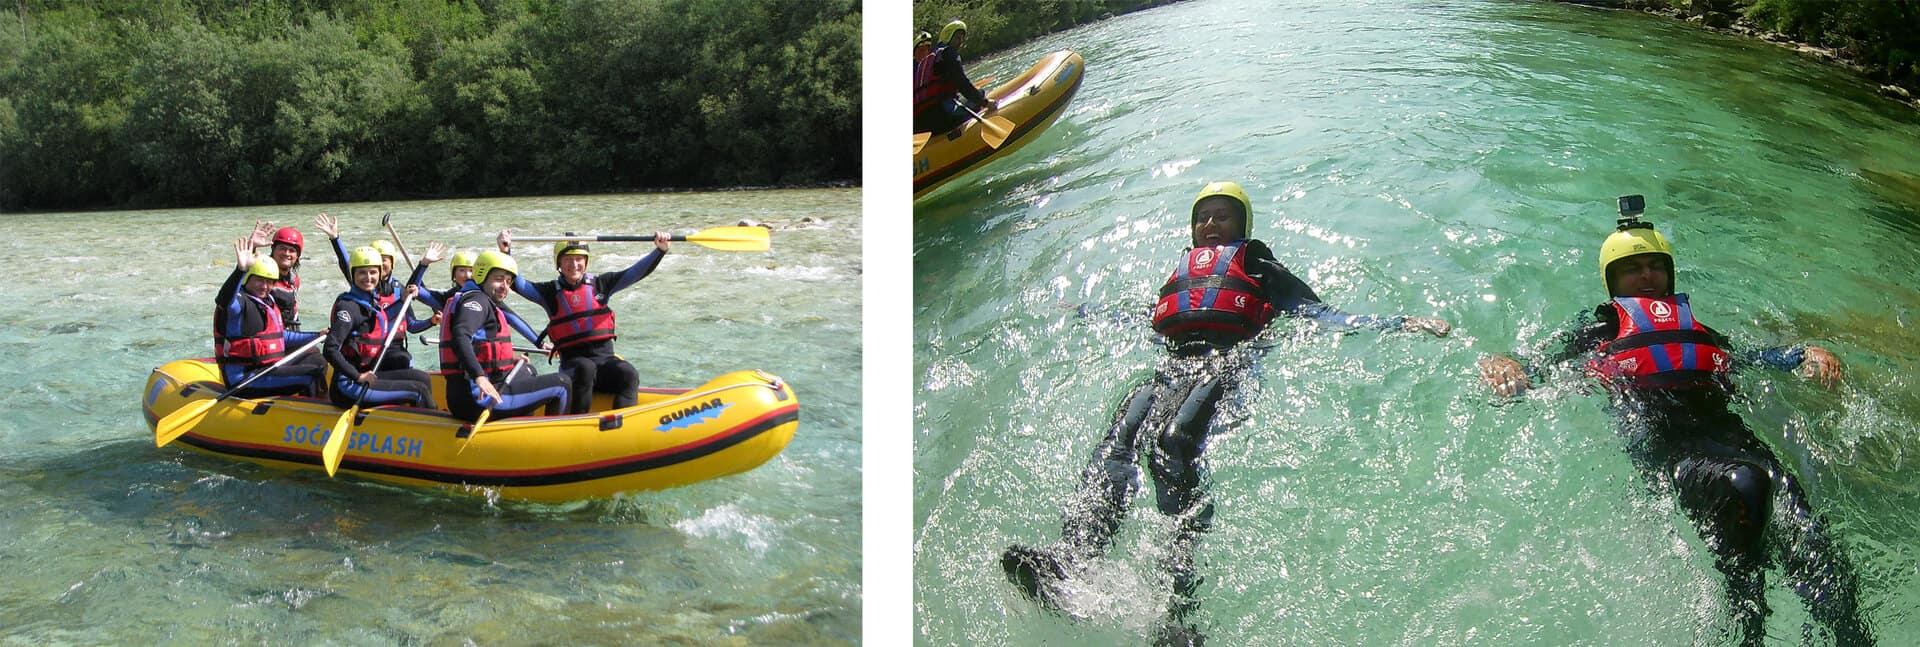 rafting rio soca